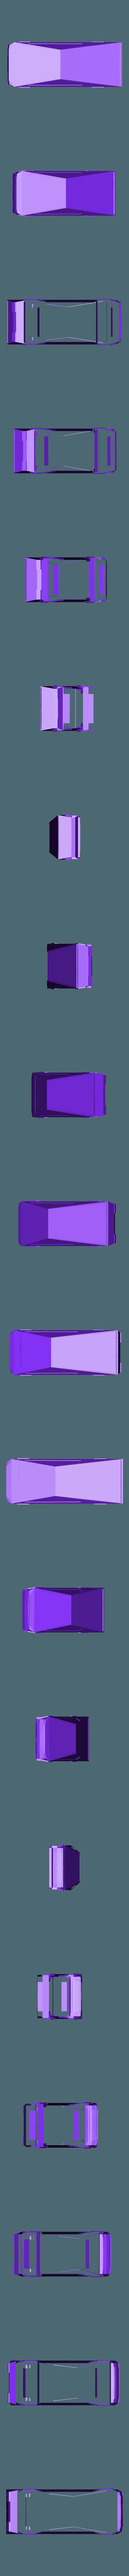 cybrtrk_body_revision2.stl Download free STL file Tesla Cybertruck • 3D printer template, auralgasm